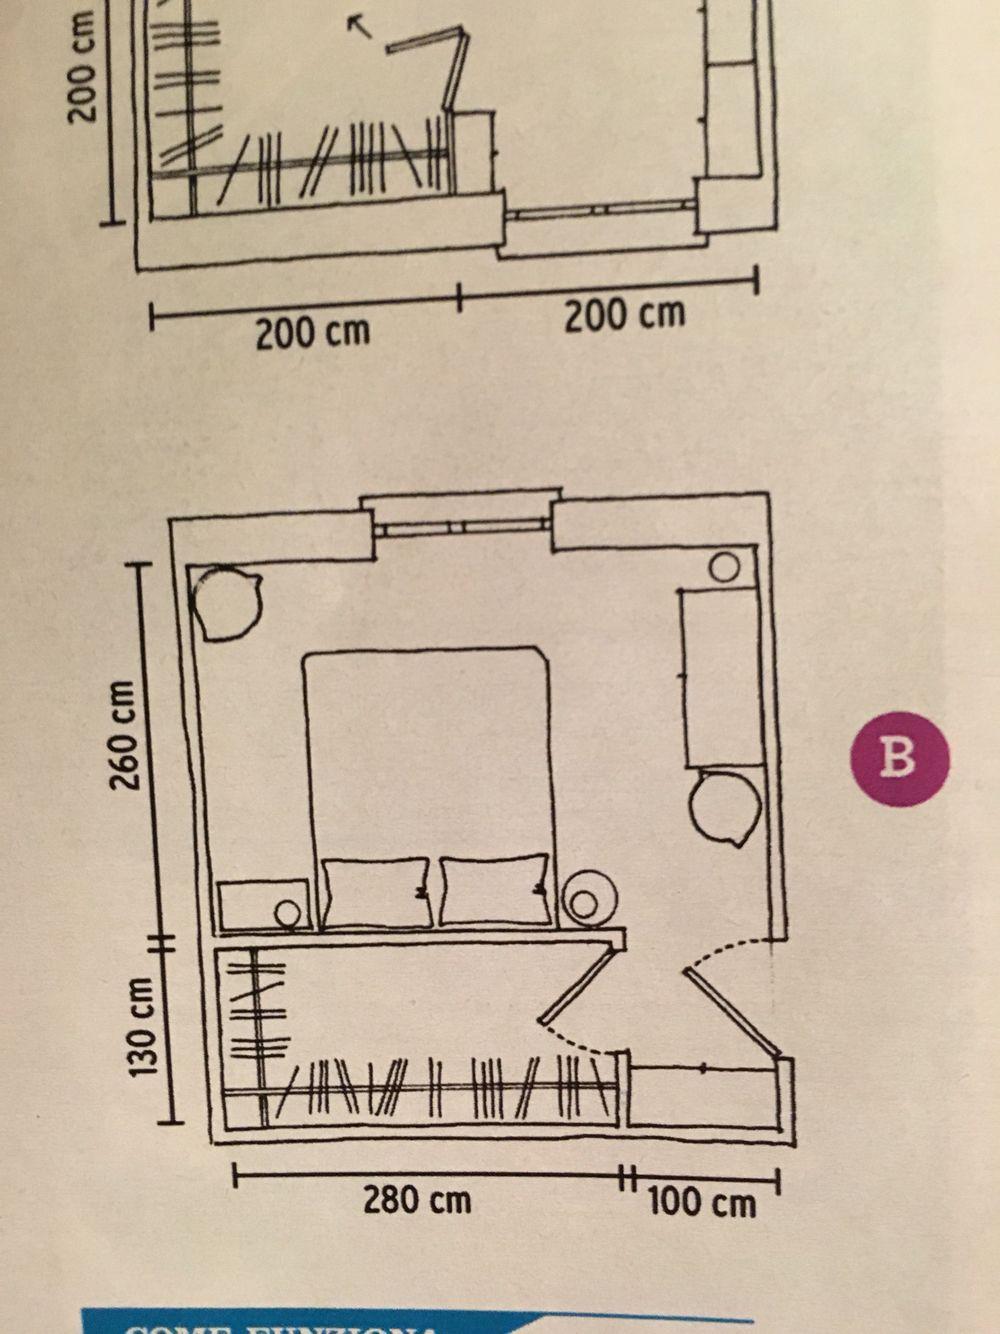 cabina armadio progetto ideas pinterest schlafzimmer schlafzimmer ideen schlafzimmer. Black Bedroom Furniture Sets. Home Design Ideas